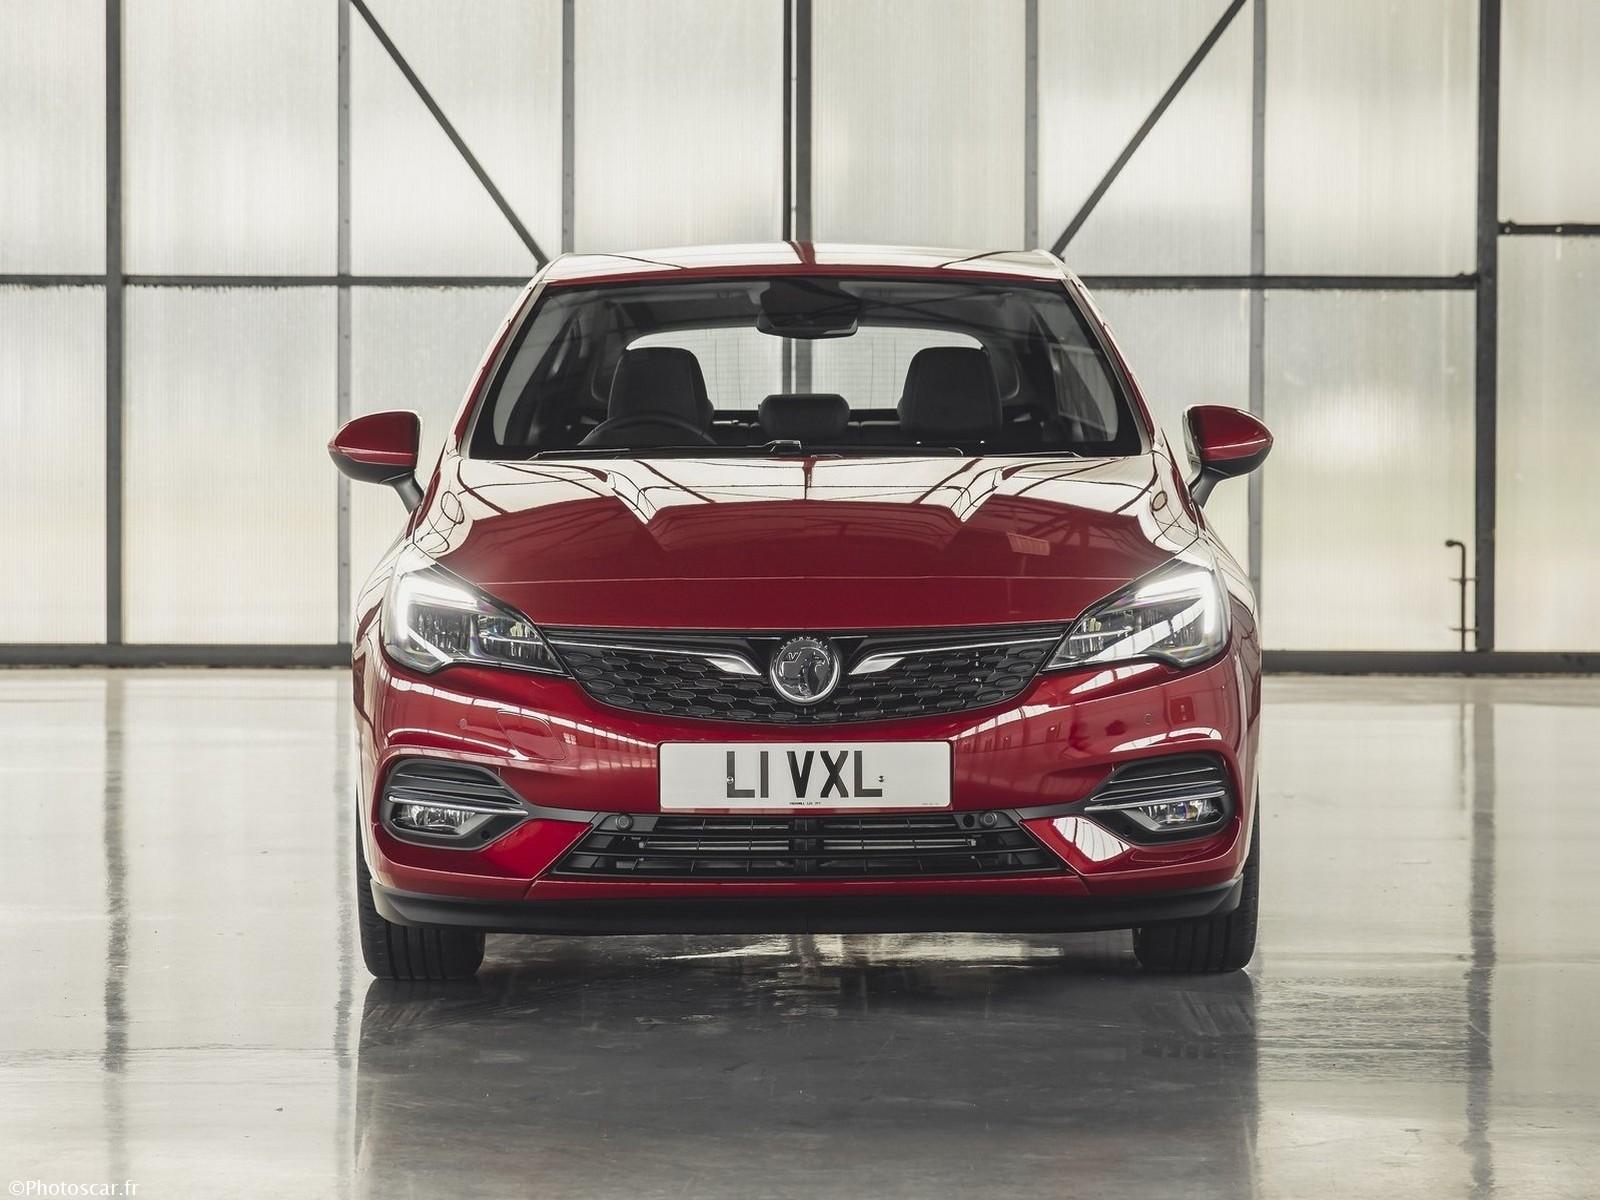 Vauxhall Astra 2020